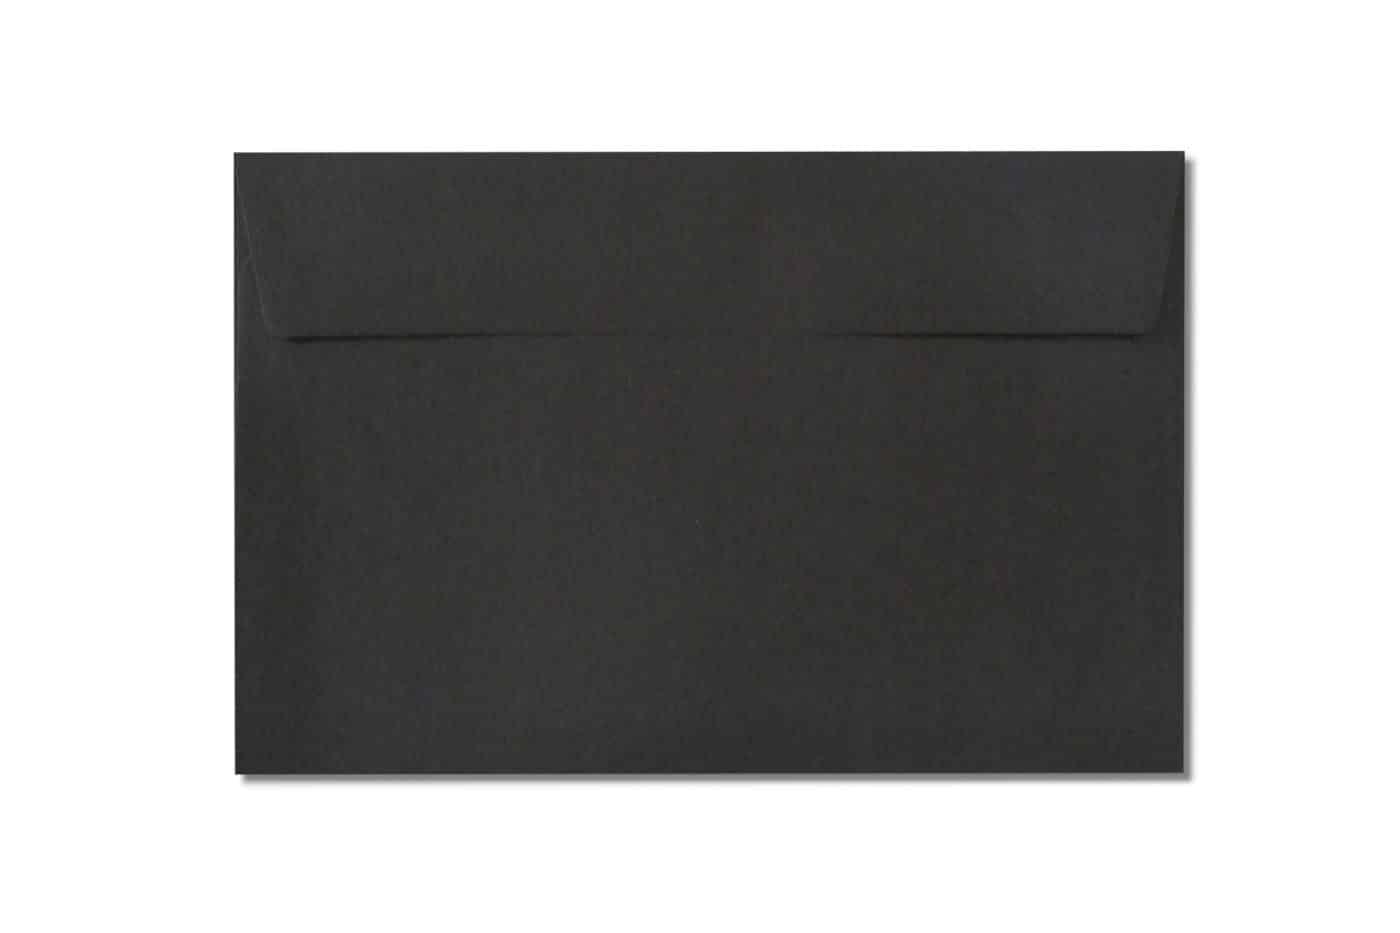 c6 c5 black envelopes 110gsm